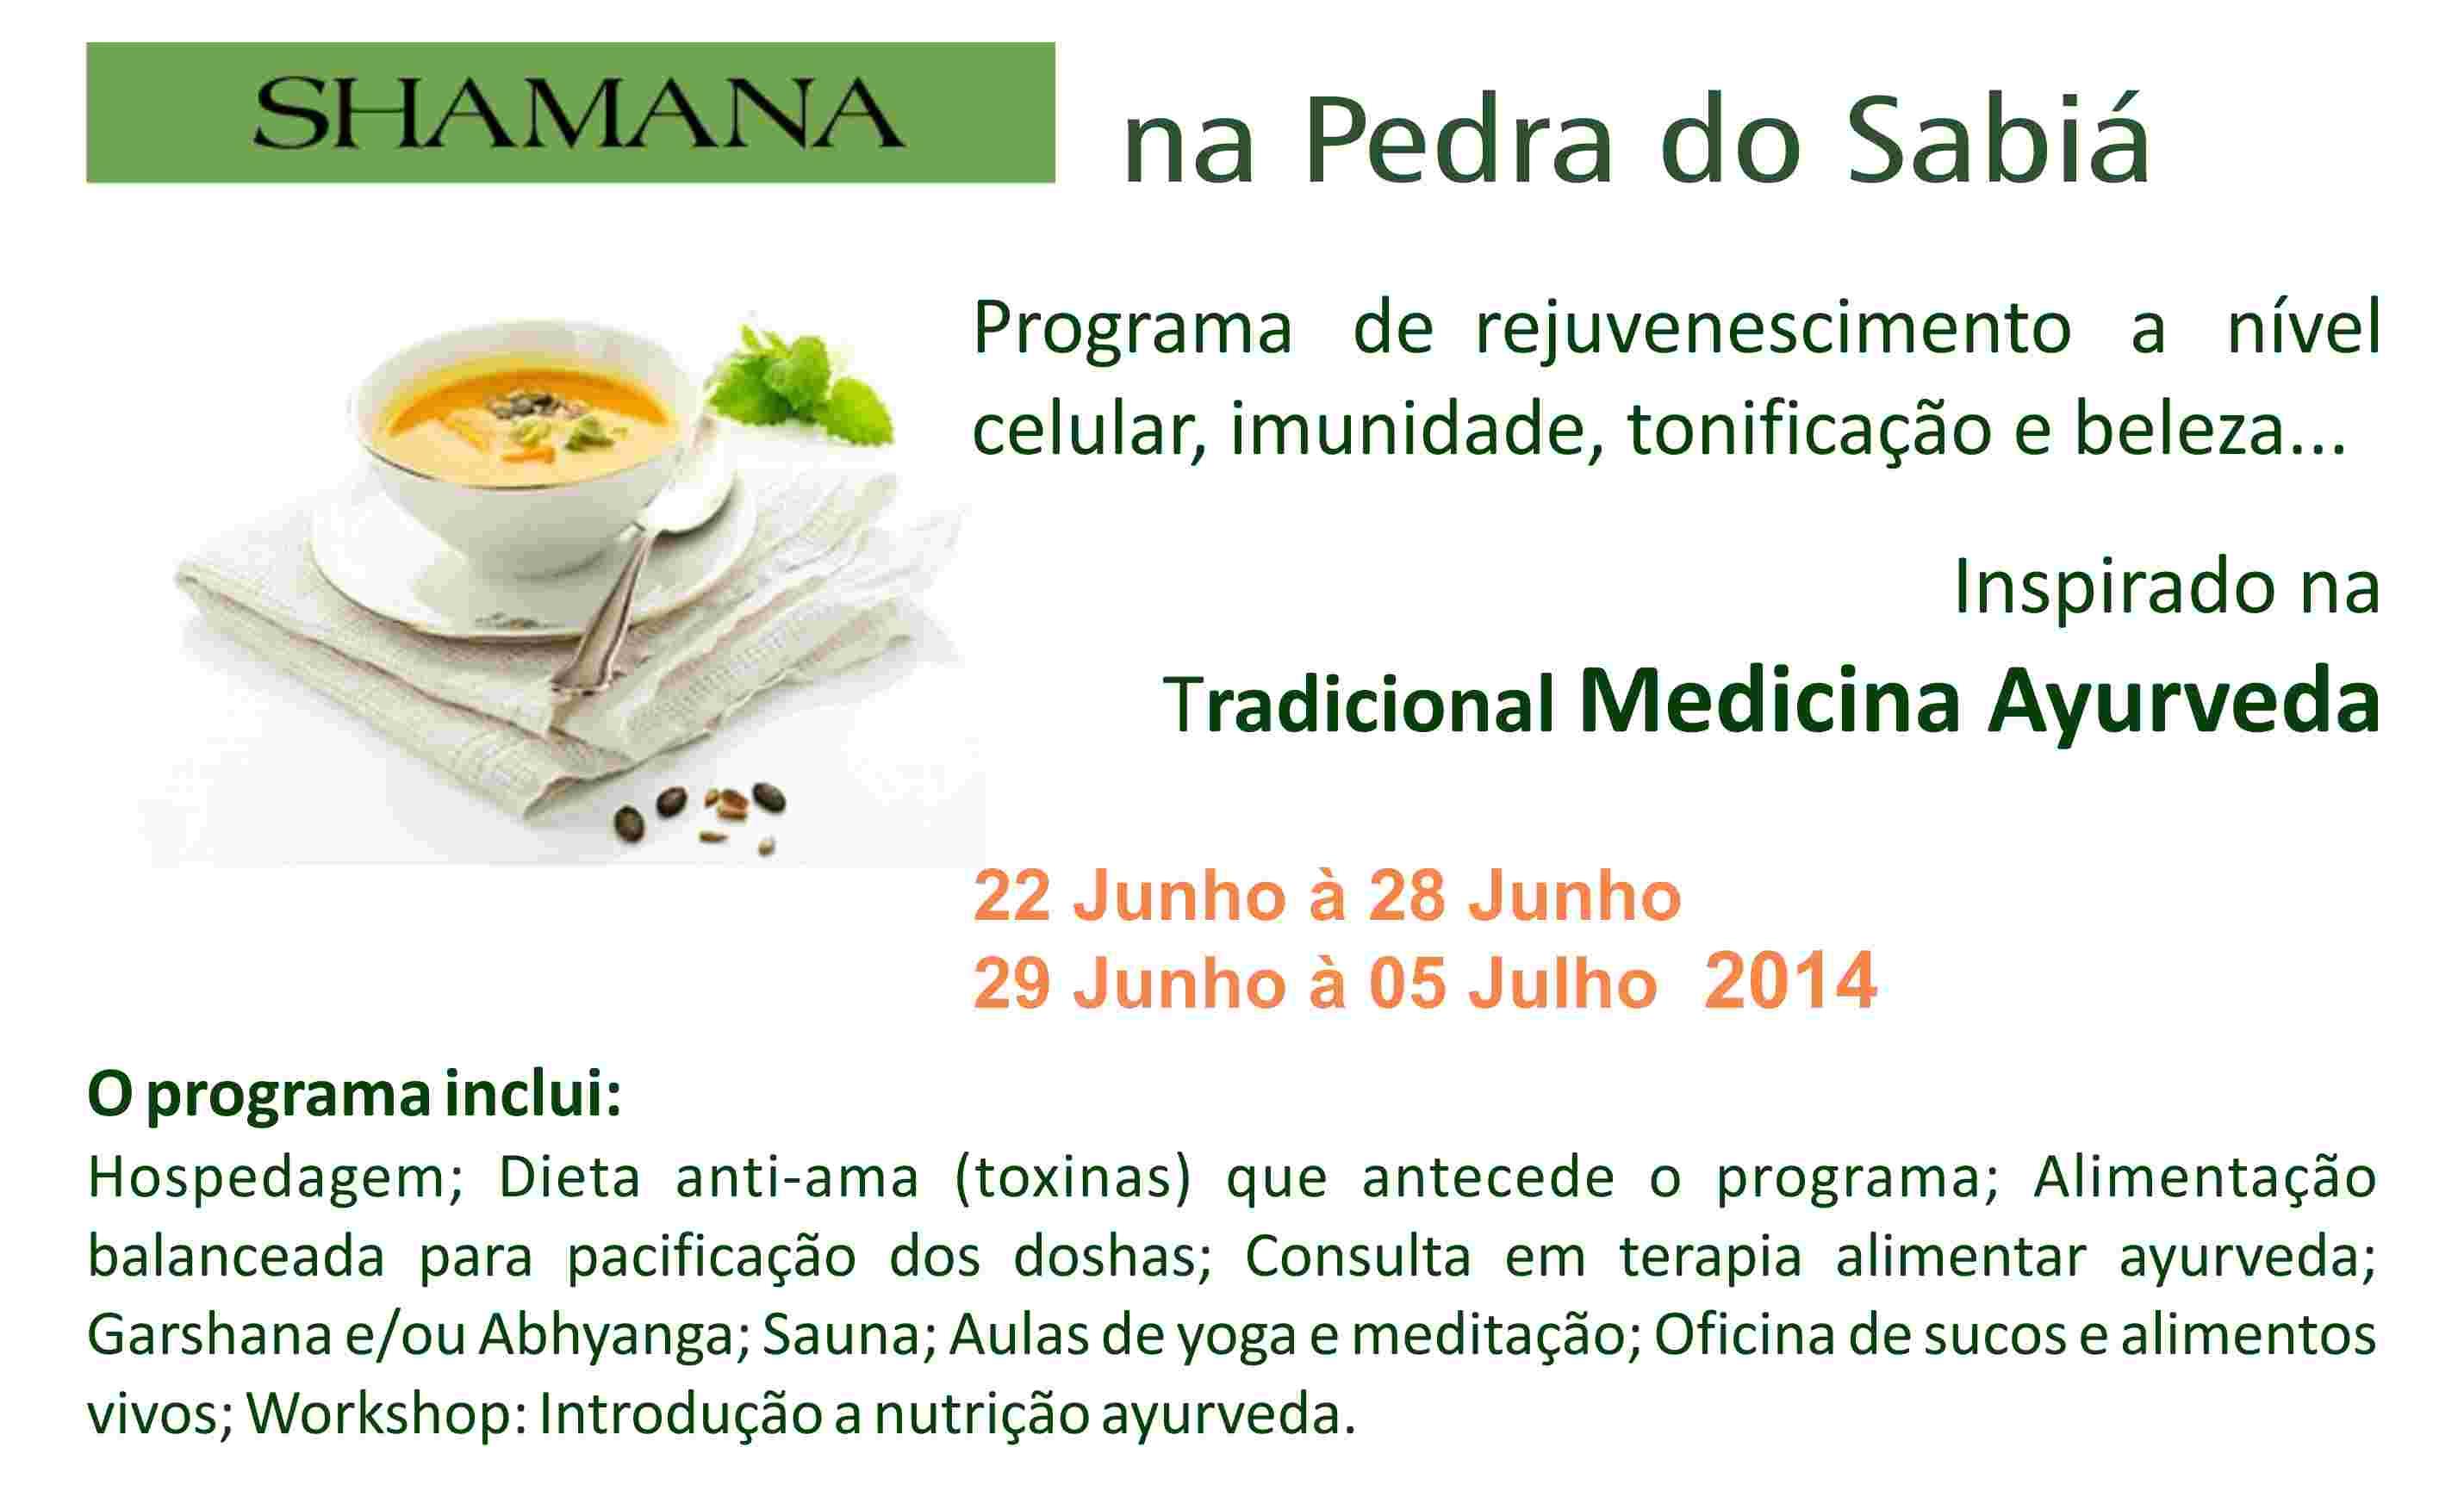 (Português) Programa de Rejuvenescimento